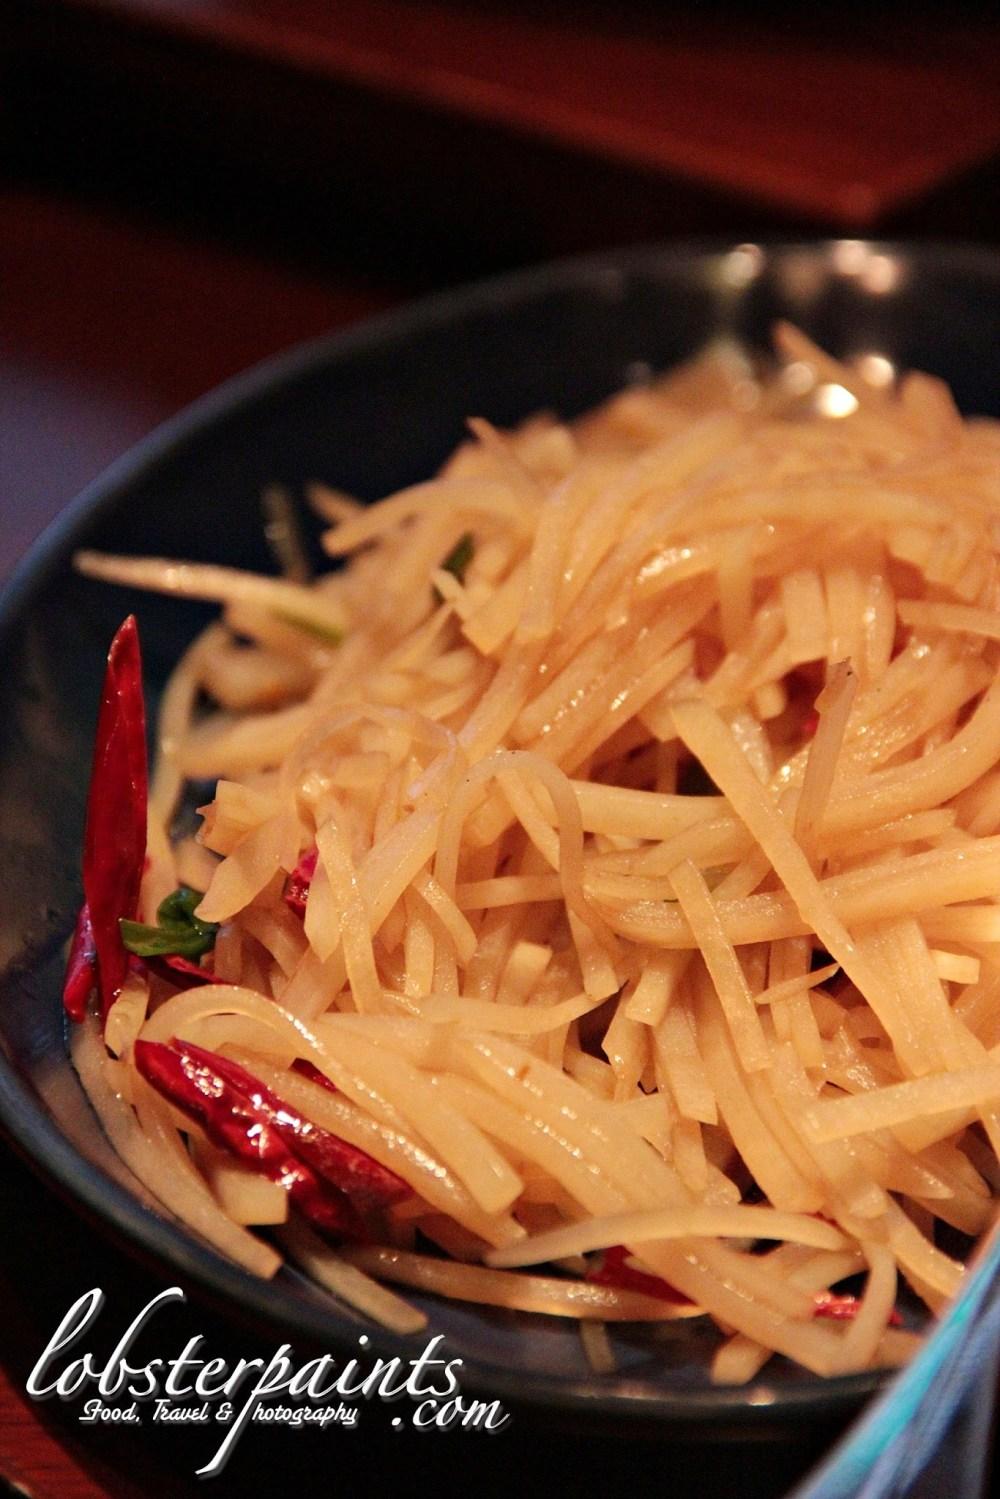 Shredded Potato, Dried Chili & Coriander 辣椒炒土豆丝 @ Beijing Kitchen 滿堂彩 | Grand Hyatt, City of Dreams, Macau